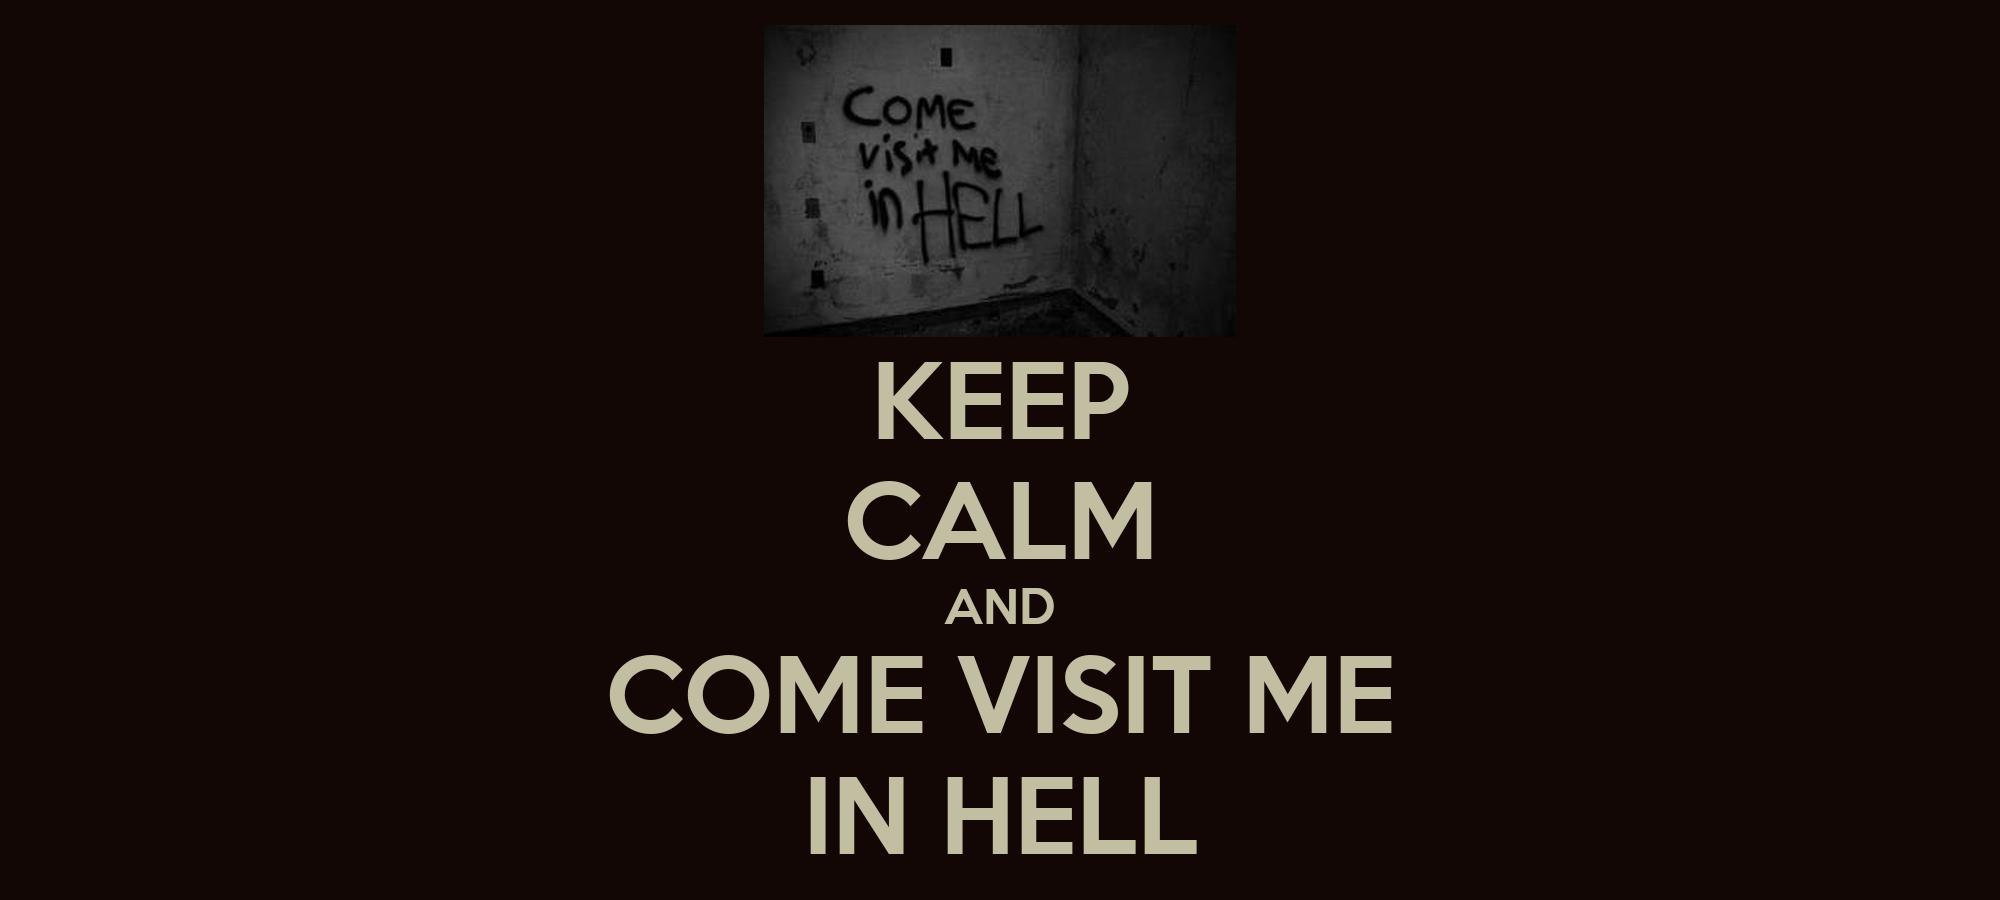 Come Visit Me Get In